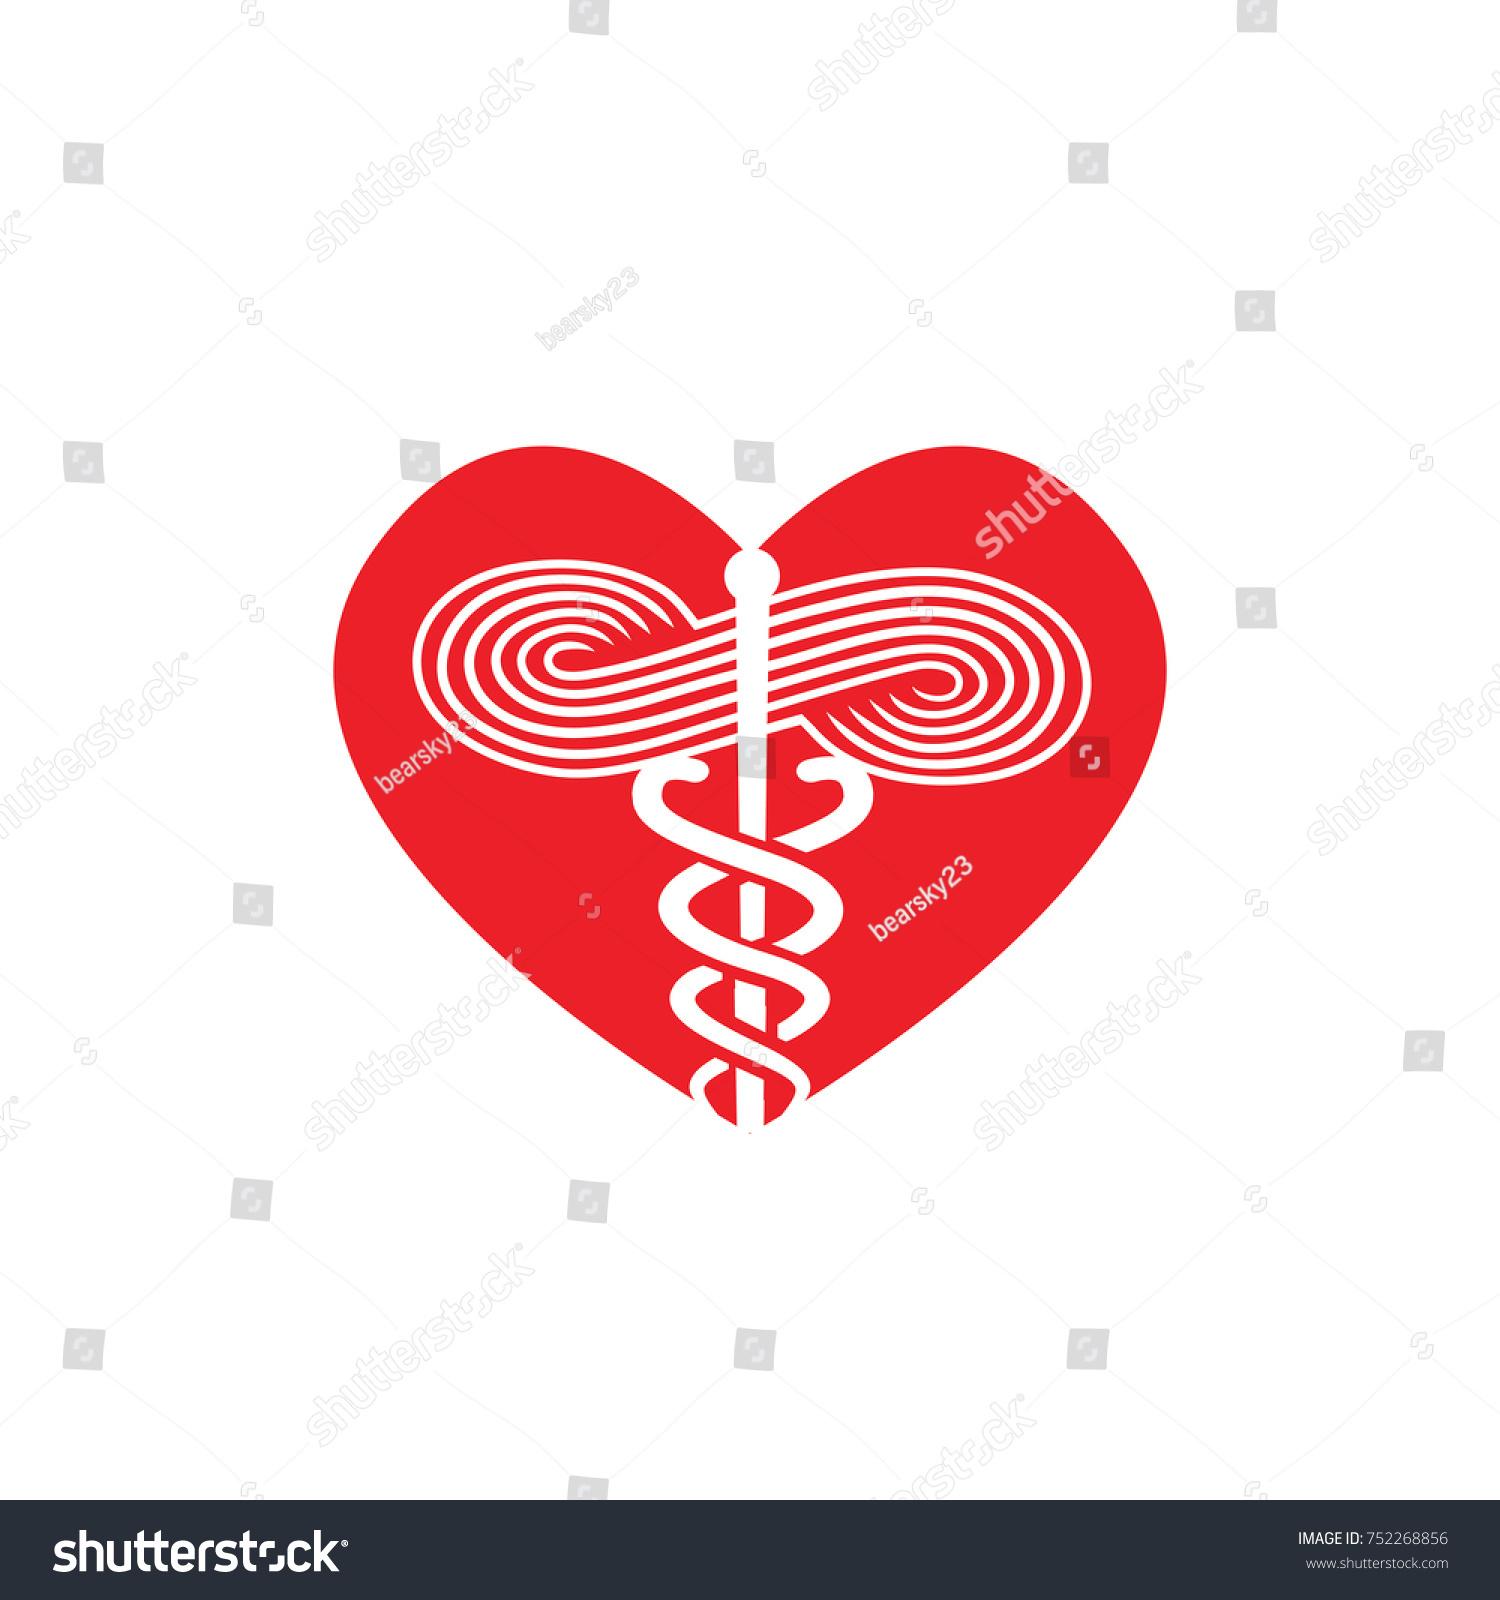 Respiratory therapist medical symbol icon rrt stock vector respiratory therapist medical symbol icon rrt rt or crt buycottarizona